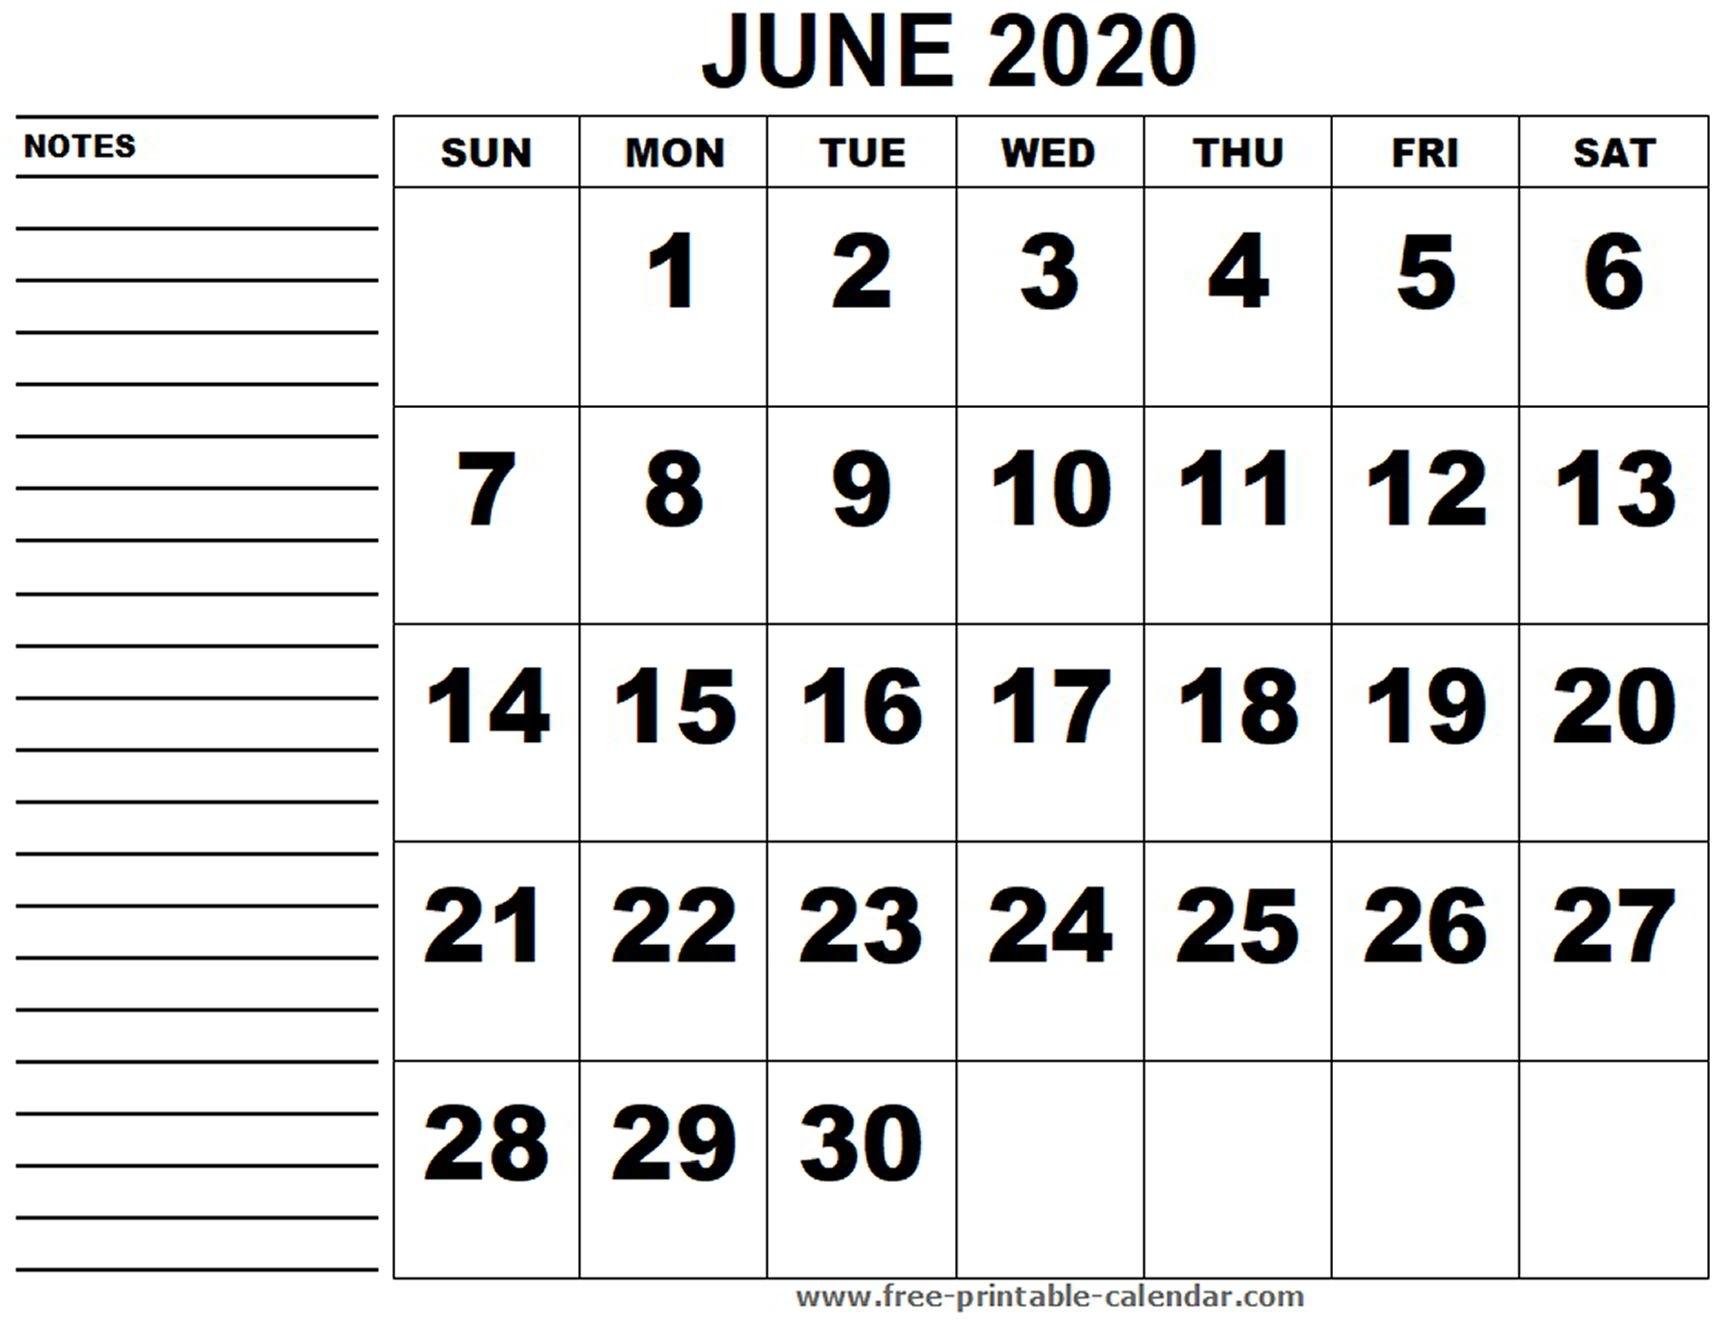 Printable Calendar June 2020 - Free-Printable-Calendar